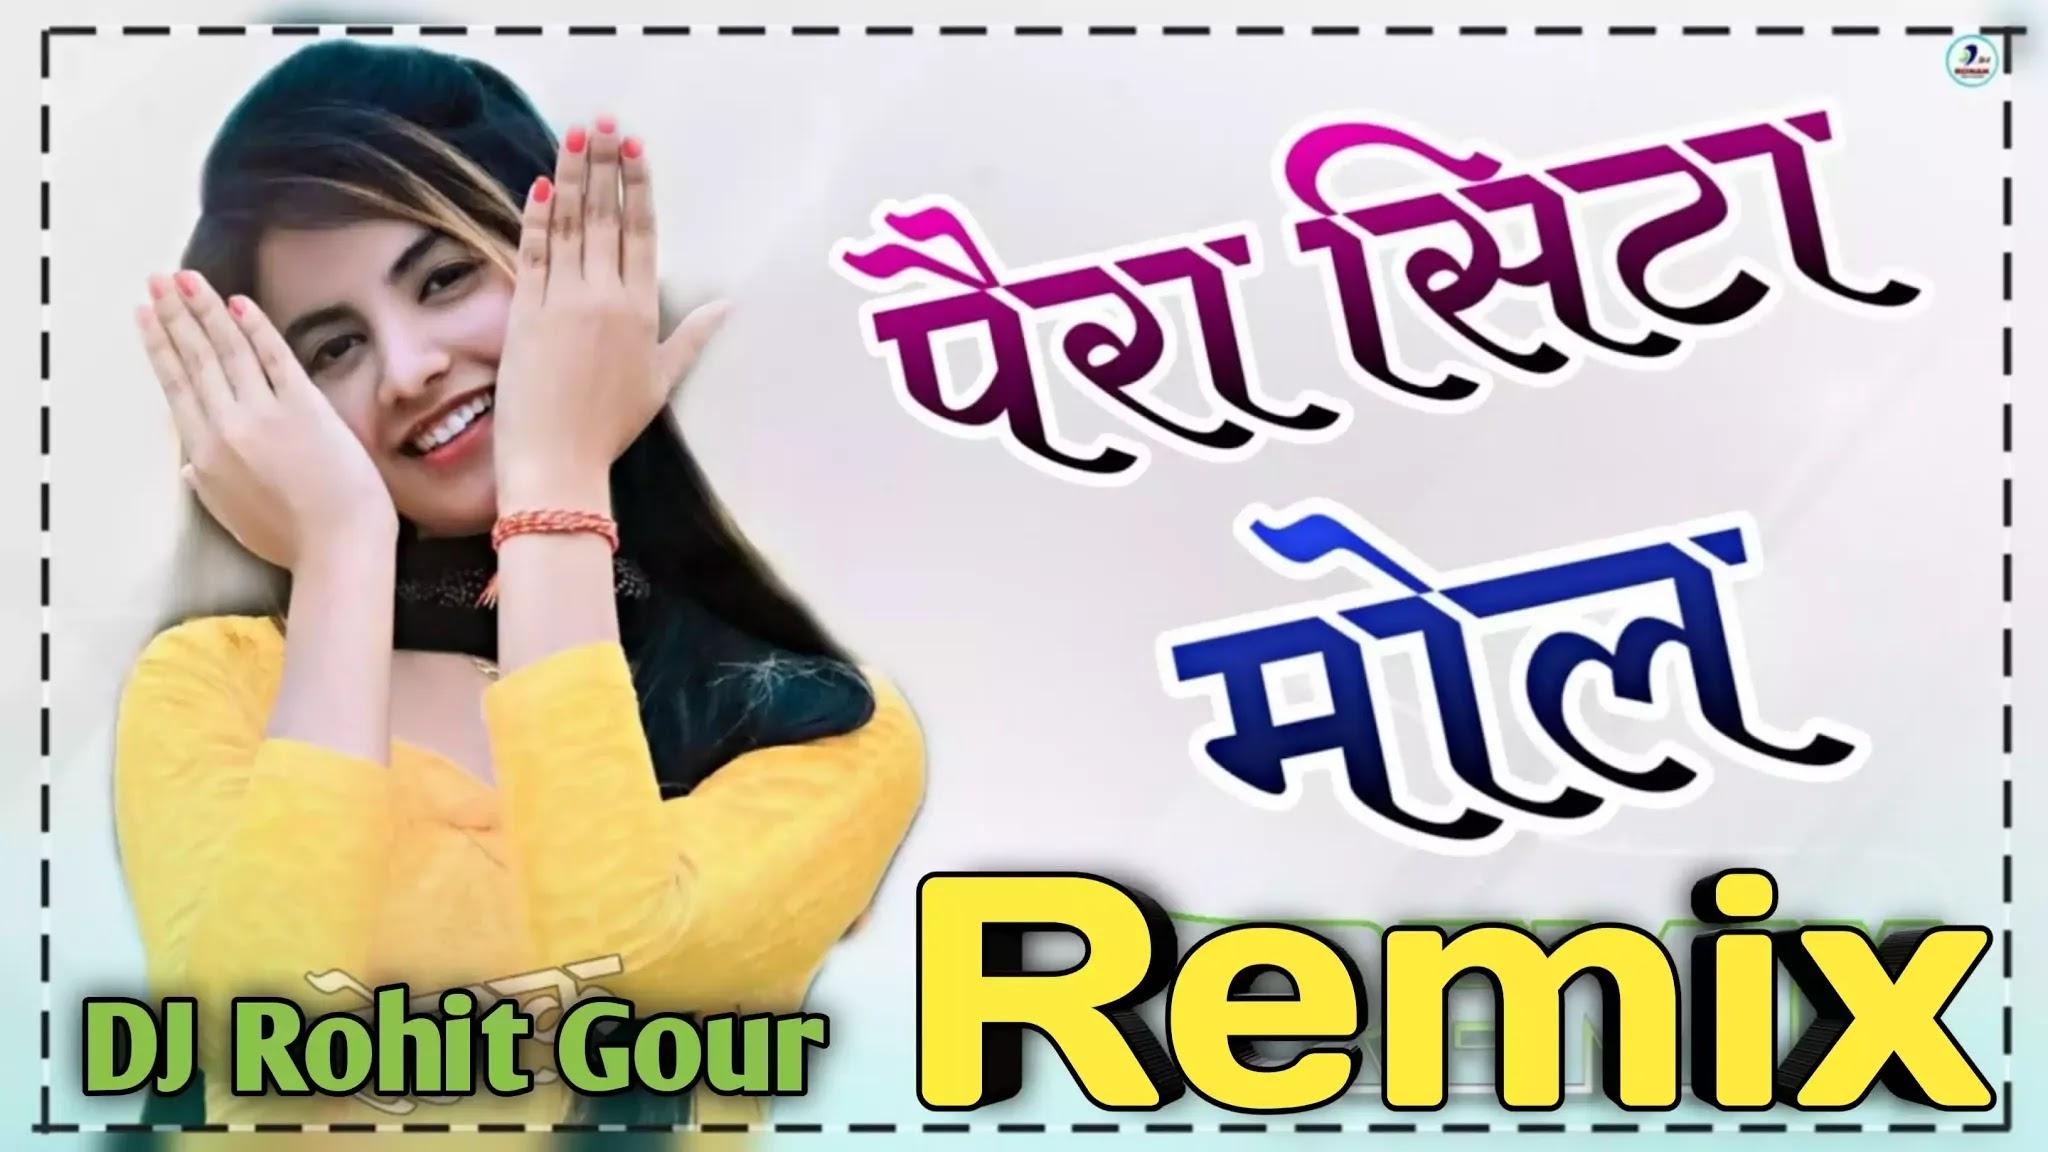 Pera Sita Mol Ajay Hooda Dj Remix Song Download